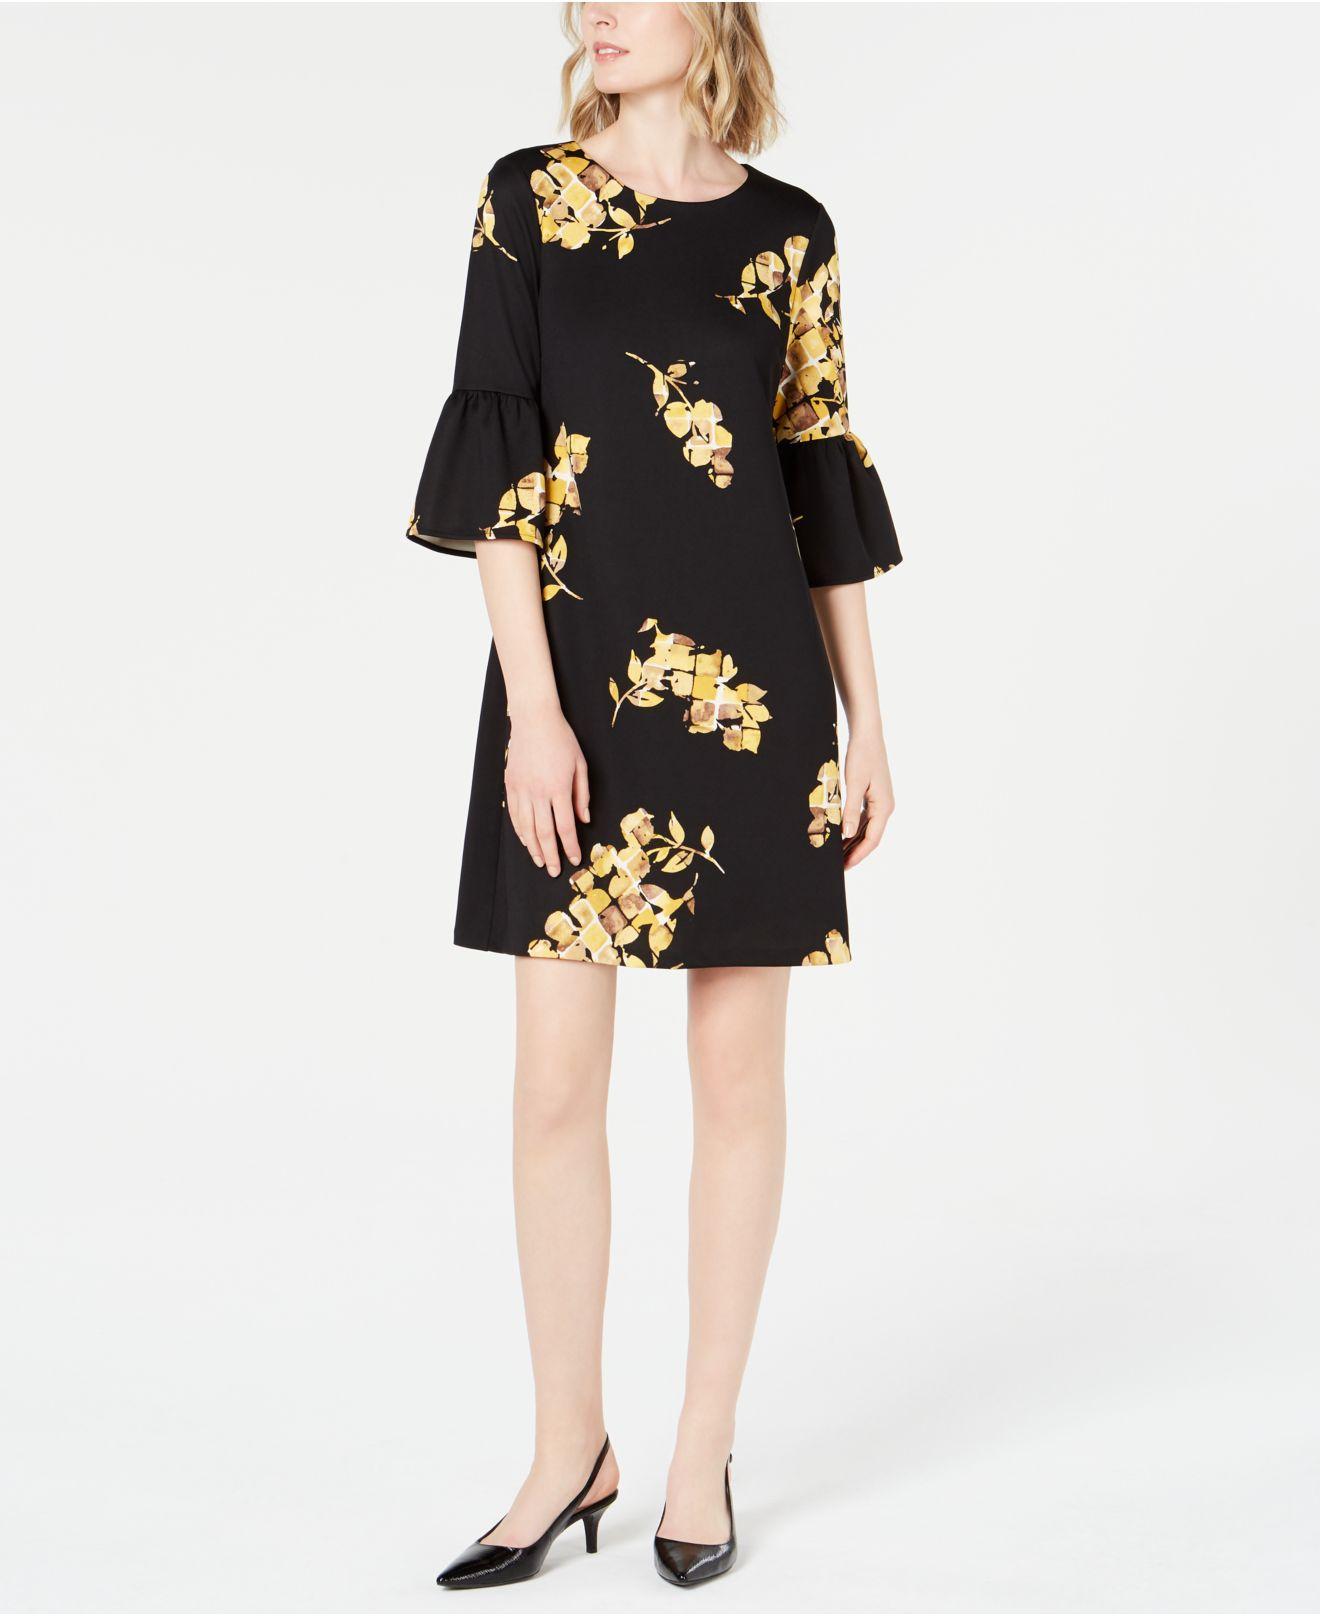 f1a6aac3561 Alfani Petite Scuba Bell-sleeve Dress